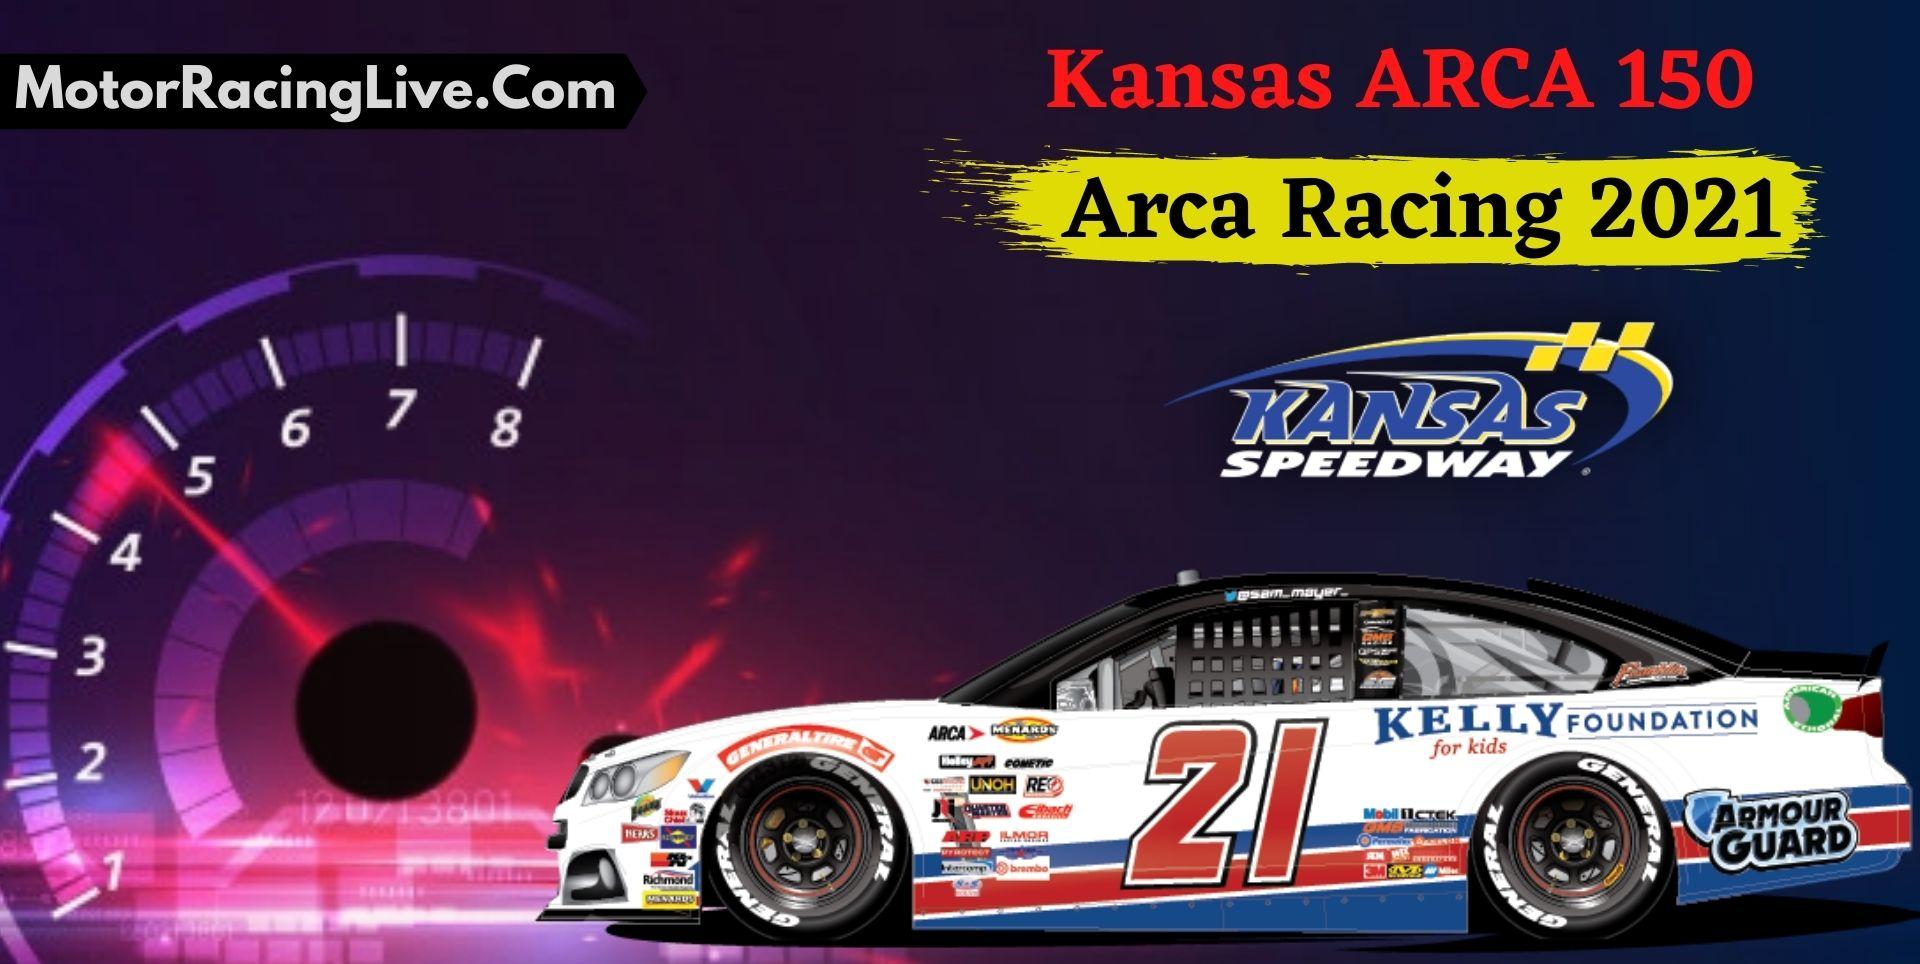 Kansas ARCA 150 Live Stream ARCA Racing 2021